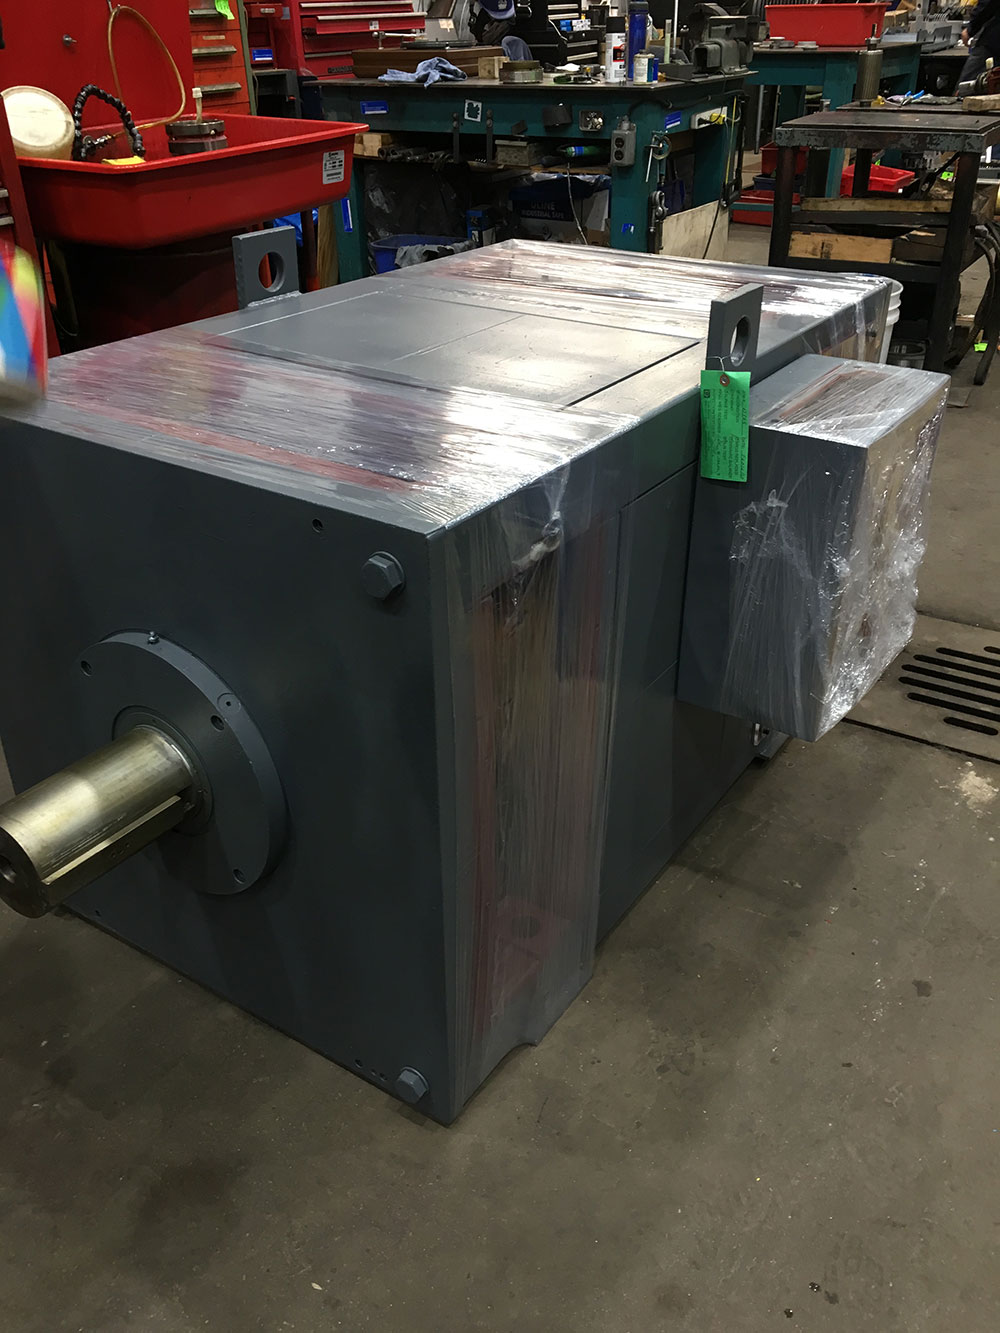 ASEA motor in the Duke Electric shop